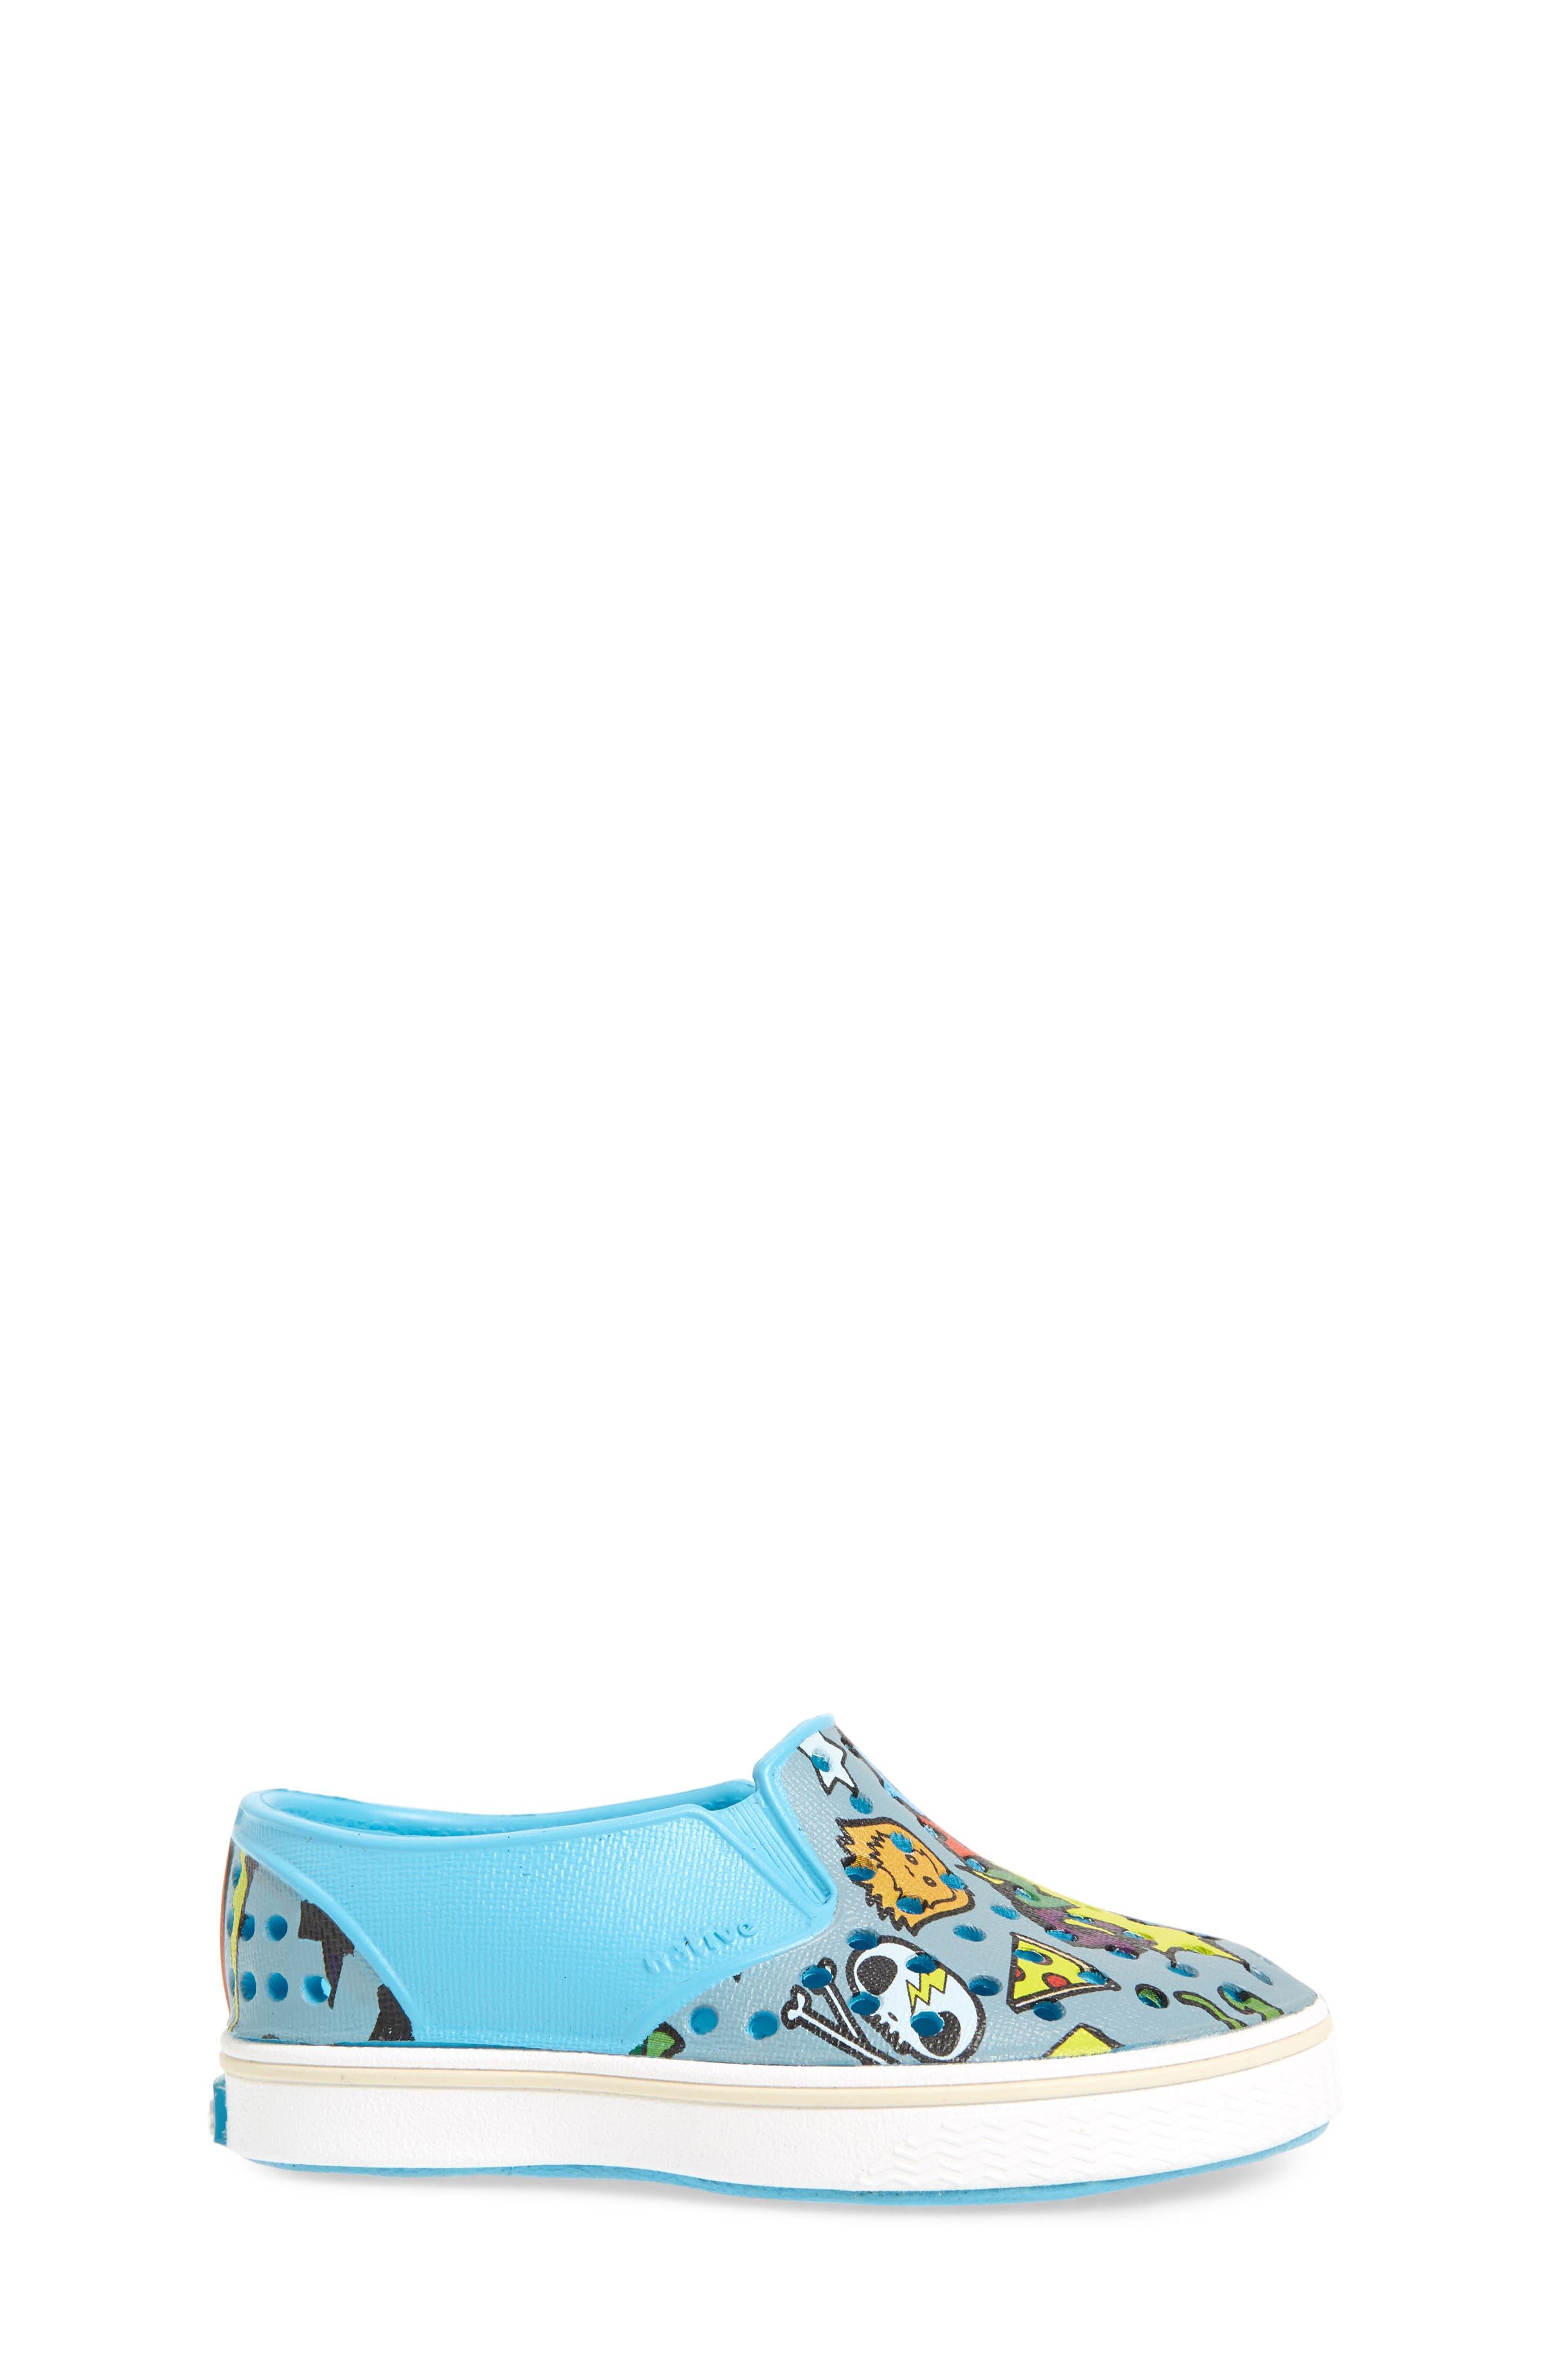 Alternate Image 3  - Native Shoes Miles Print Slip-On Sneaker (Baby, Walker, Toddler, Little Kid & Big Kid)